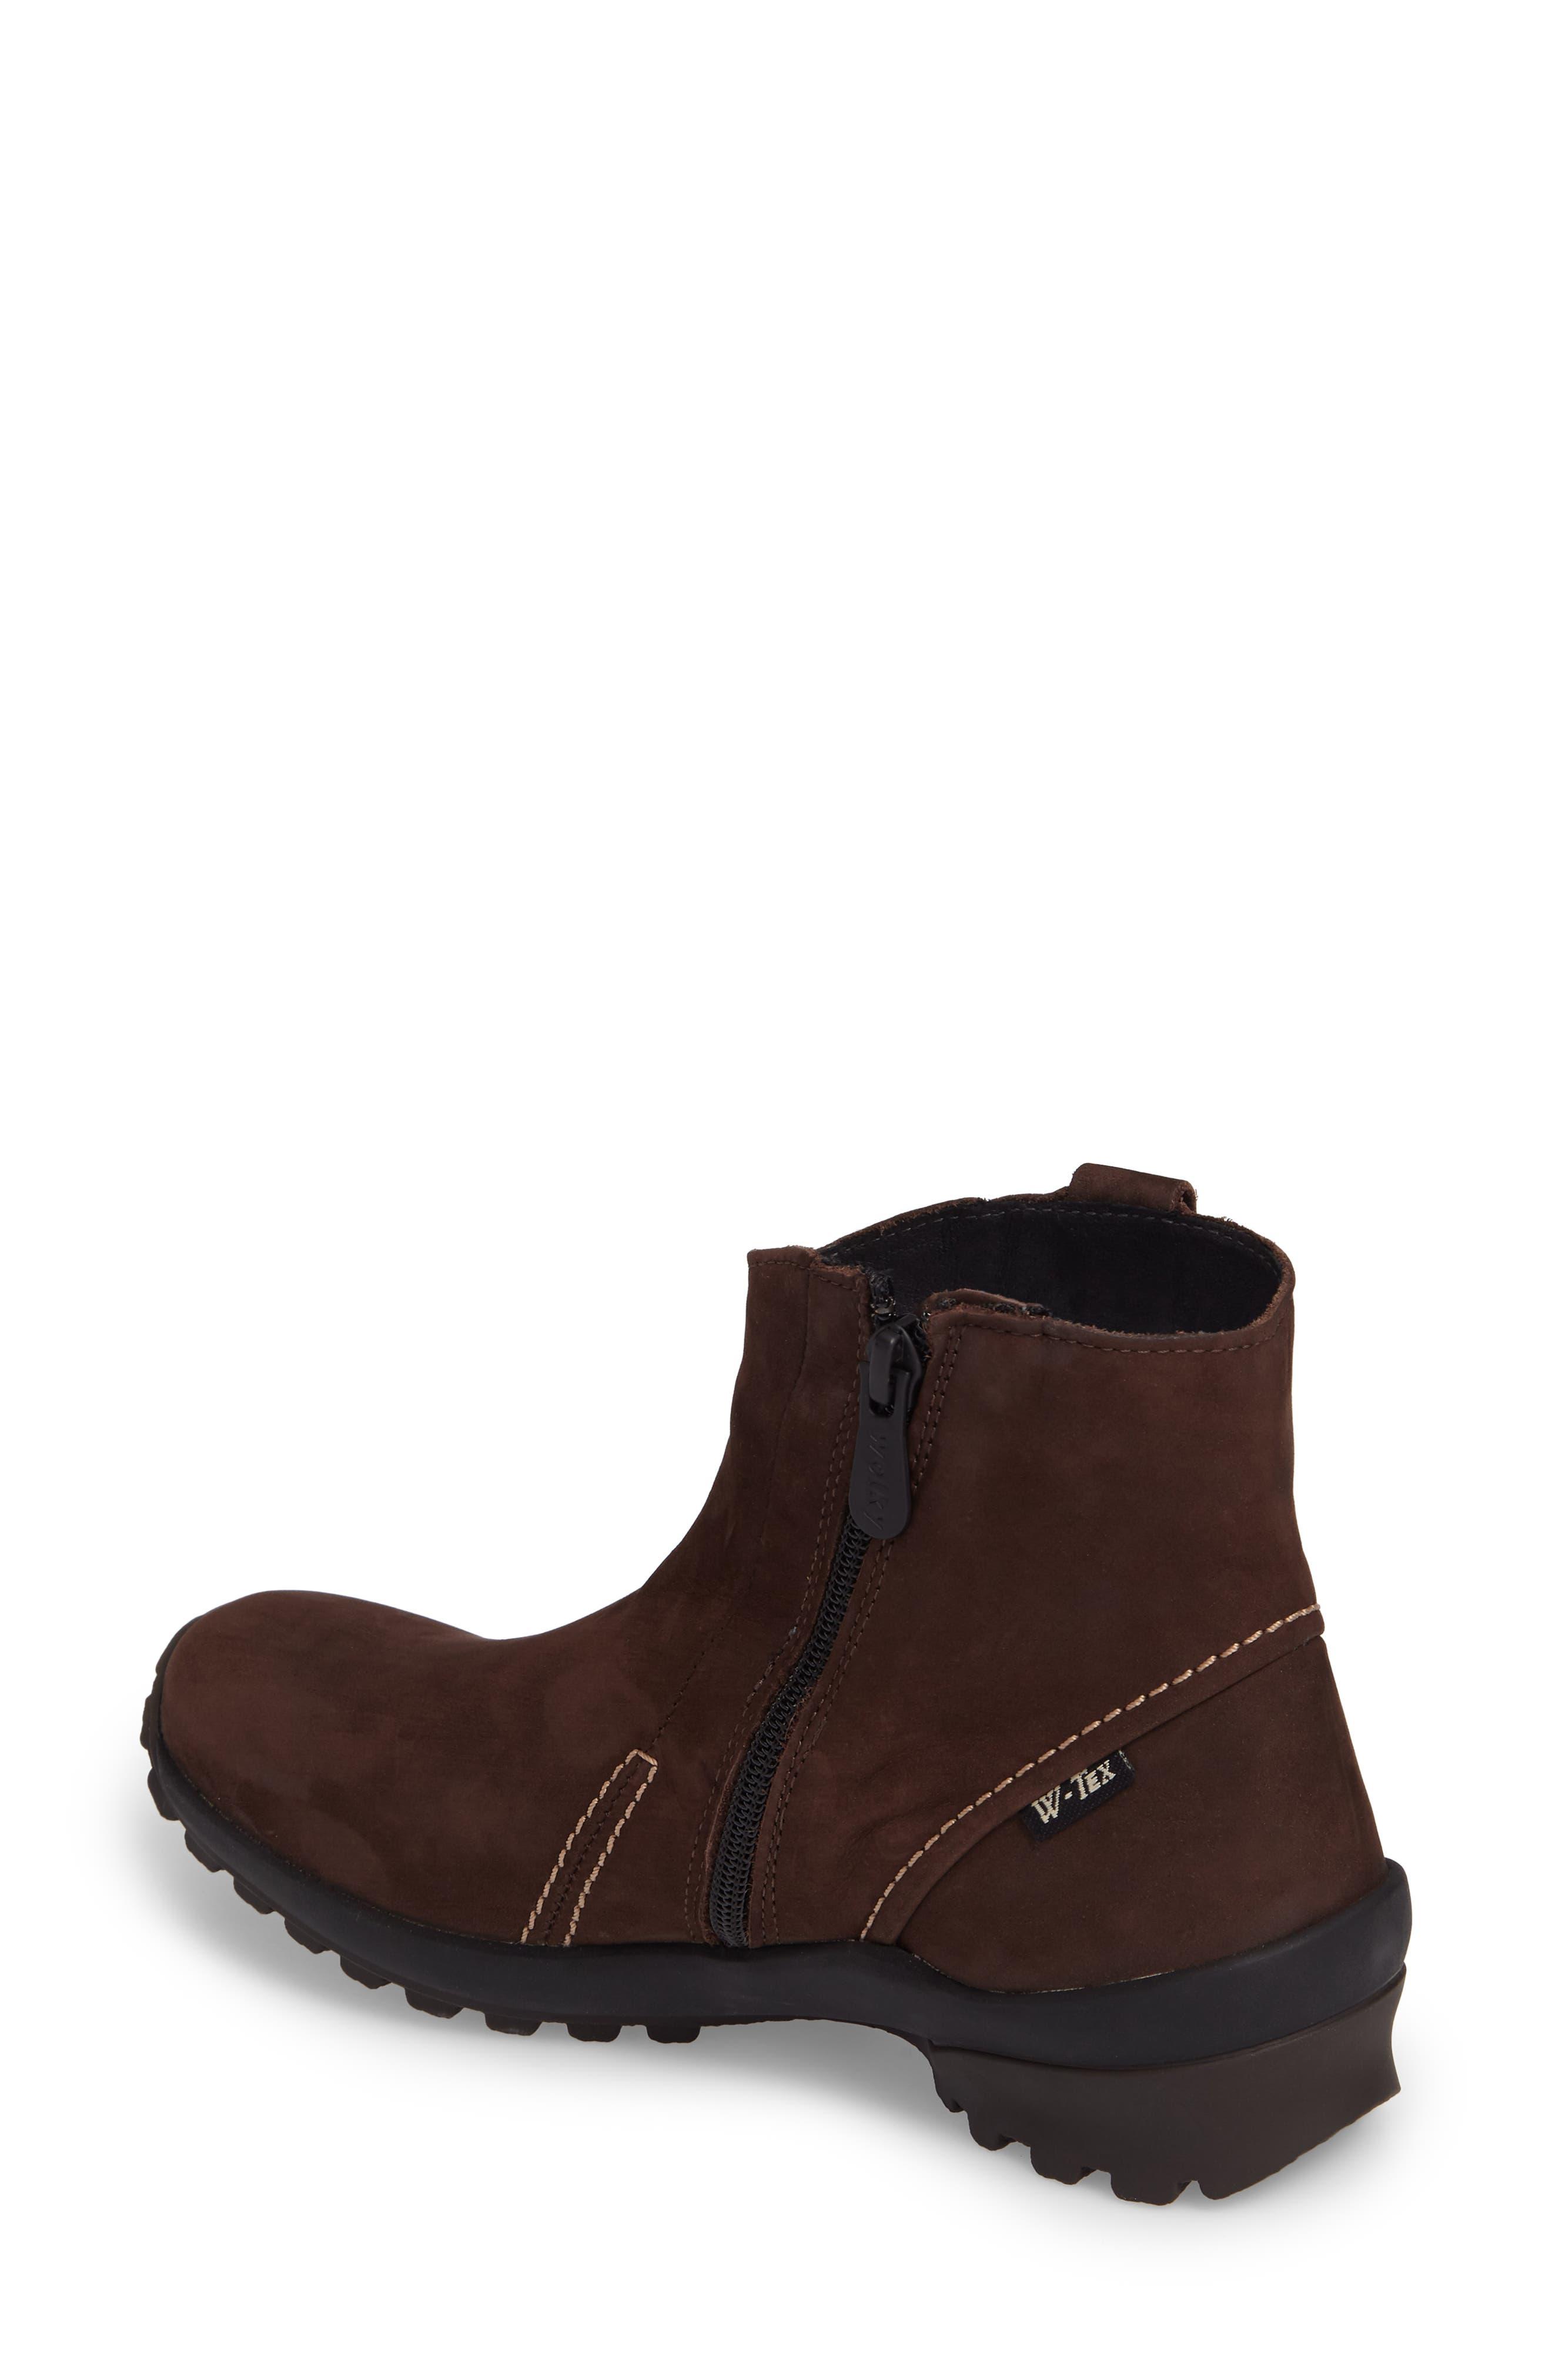 Alternate Image 2  - Wolky Zion Waterproof Insulated Winter Boot (Women)